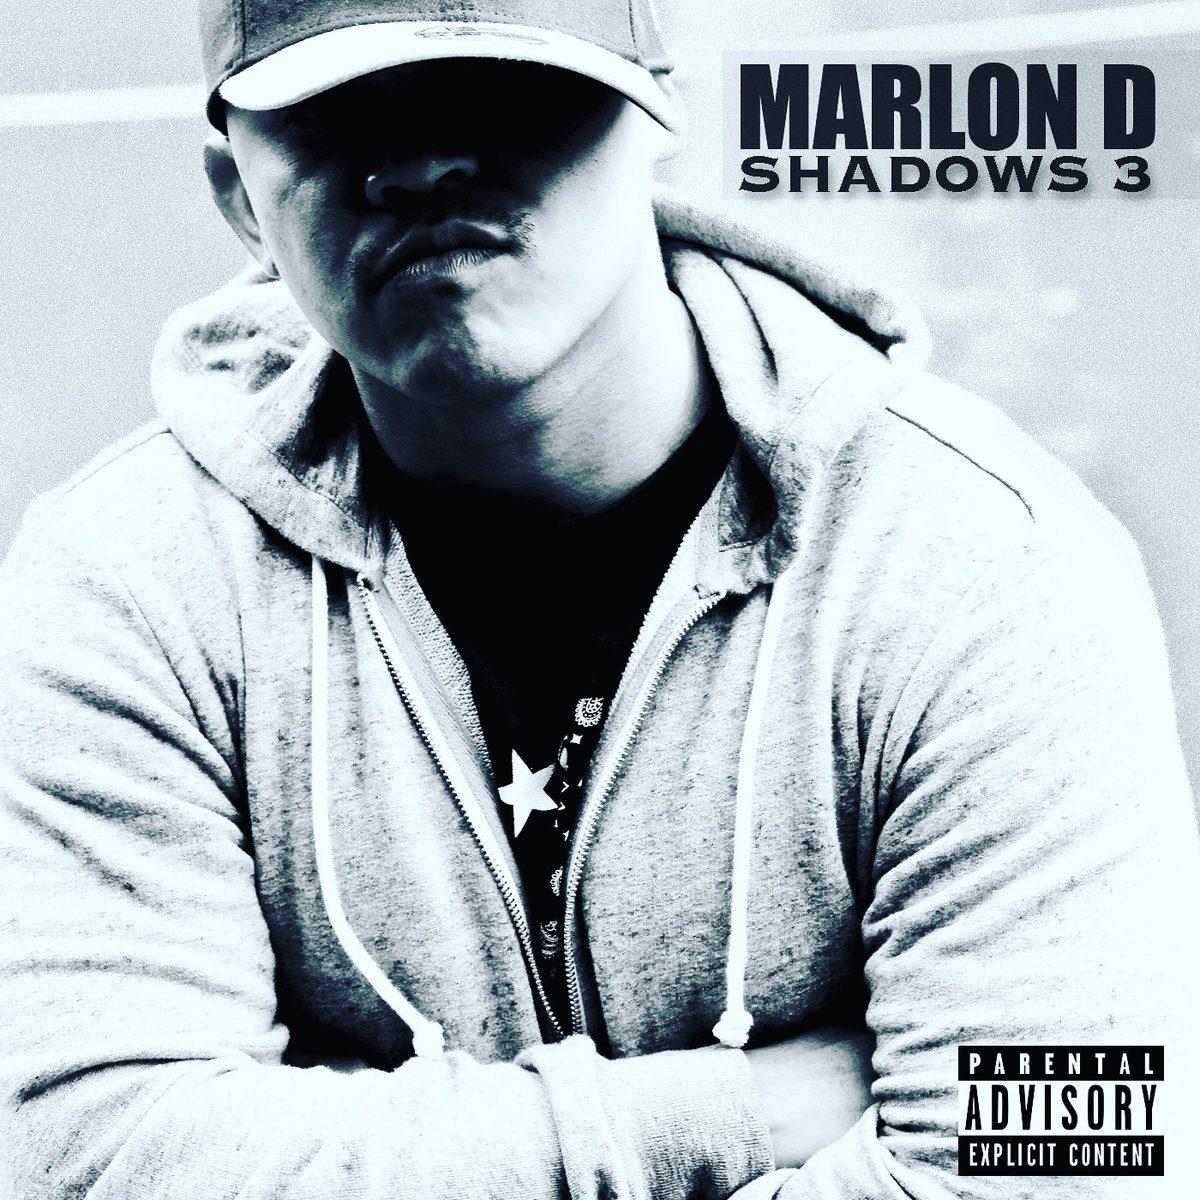 Marlon D - Shadows 3 (Album Review)